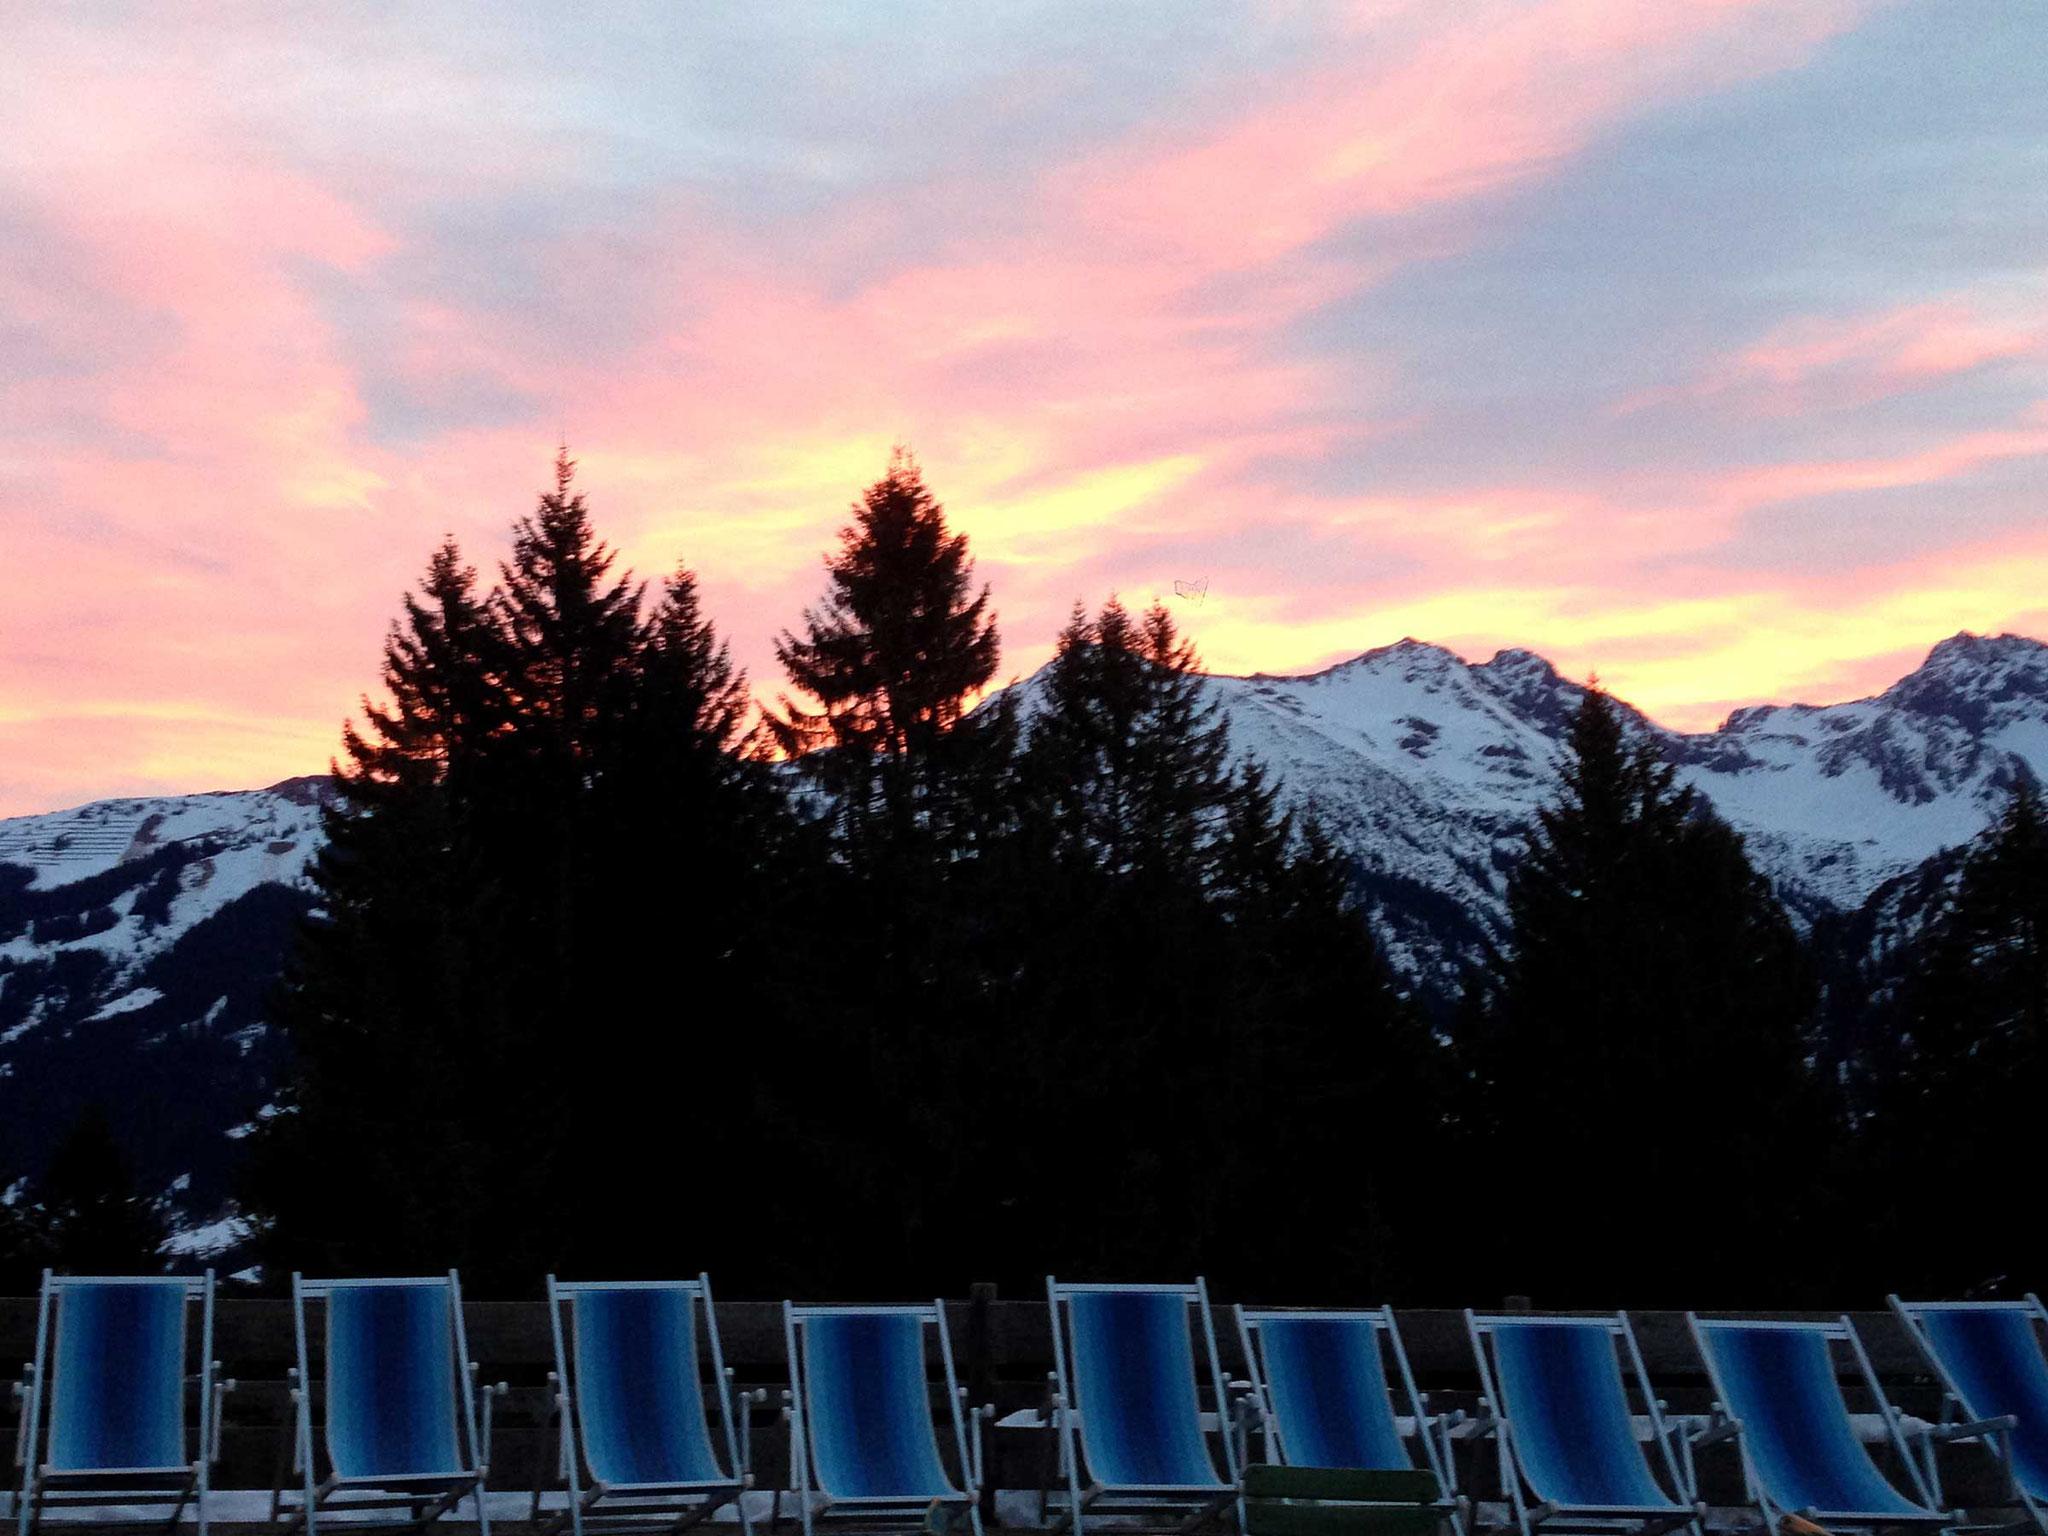 Berggasthof Bühlalpe, Kleinwalsertal – Winter Liegestühle